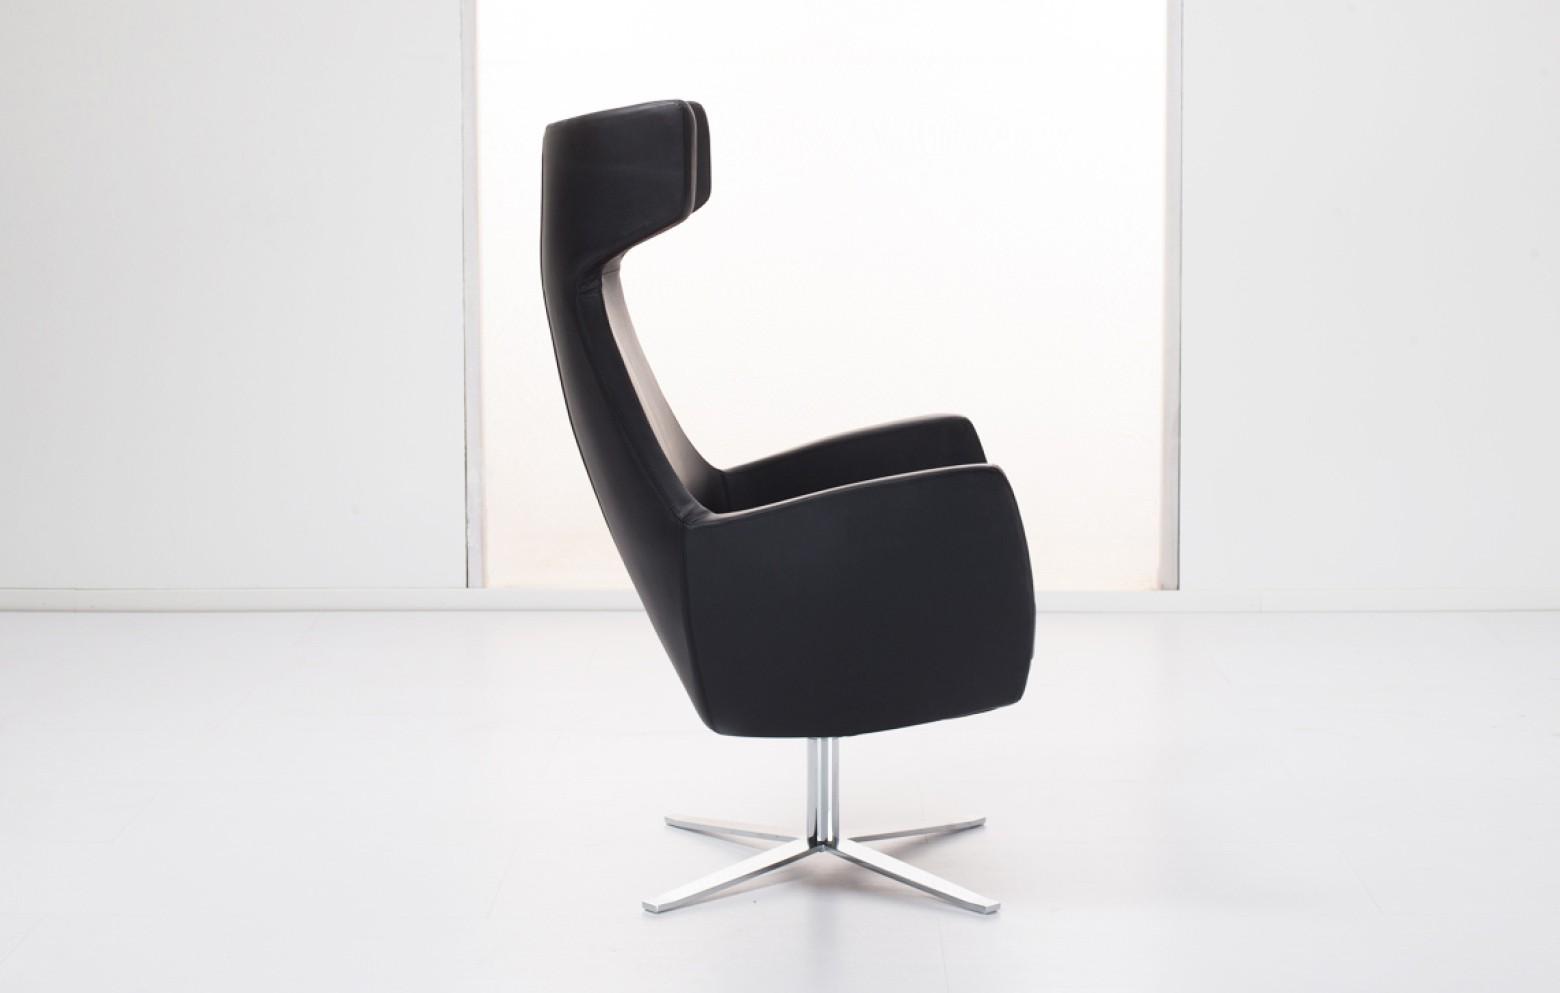 drehfu f r sessel home image ideen. Black Bedroom Furniture Sets. Home Design Ideas